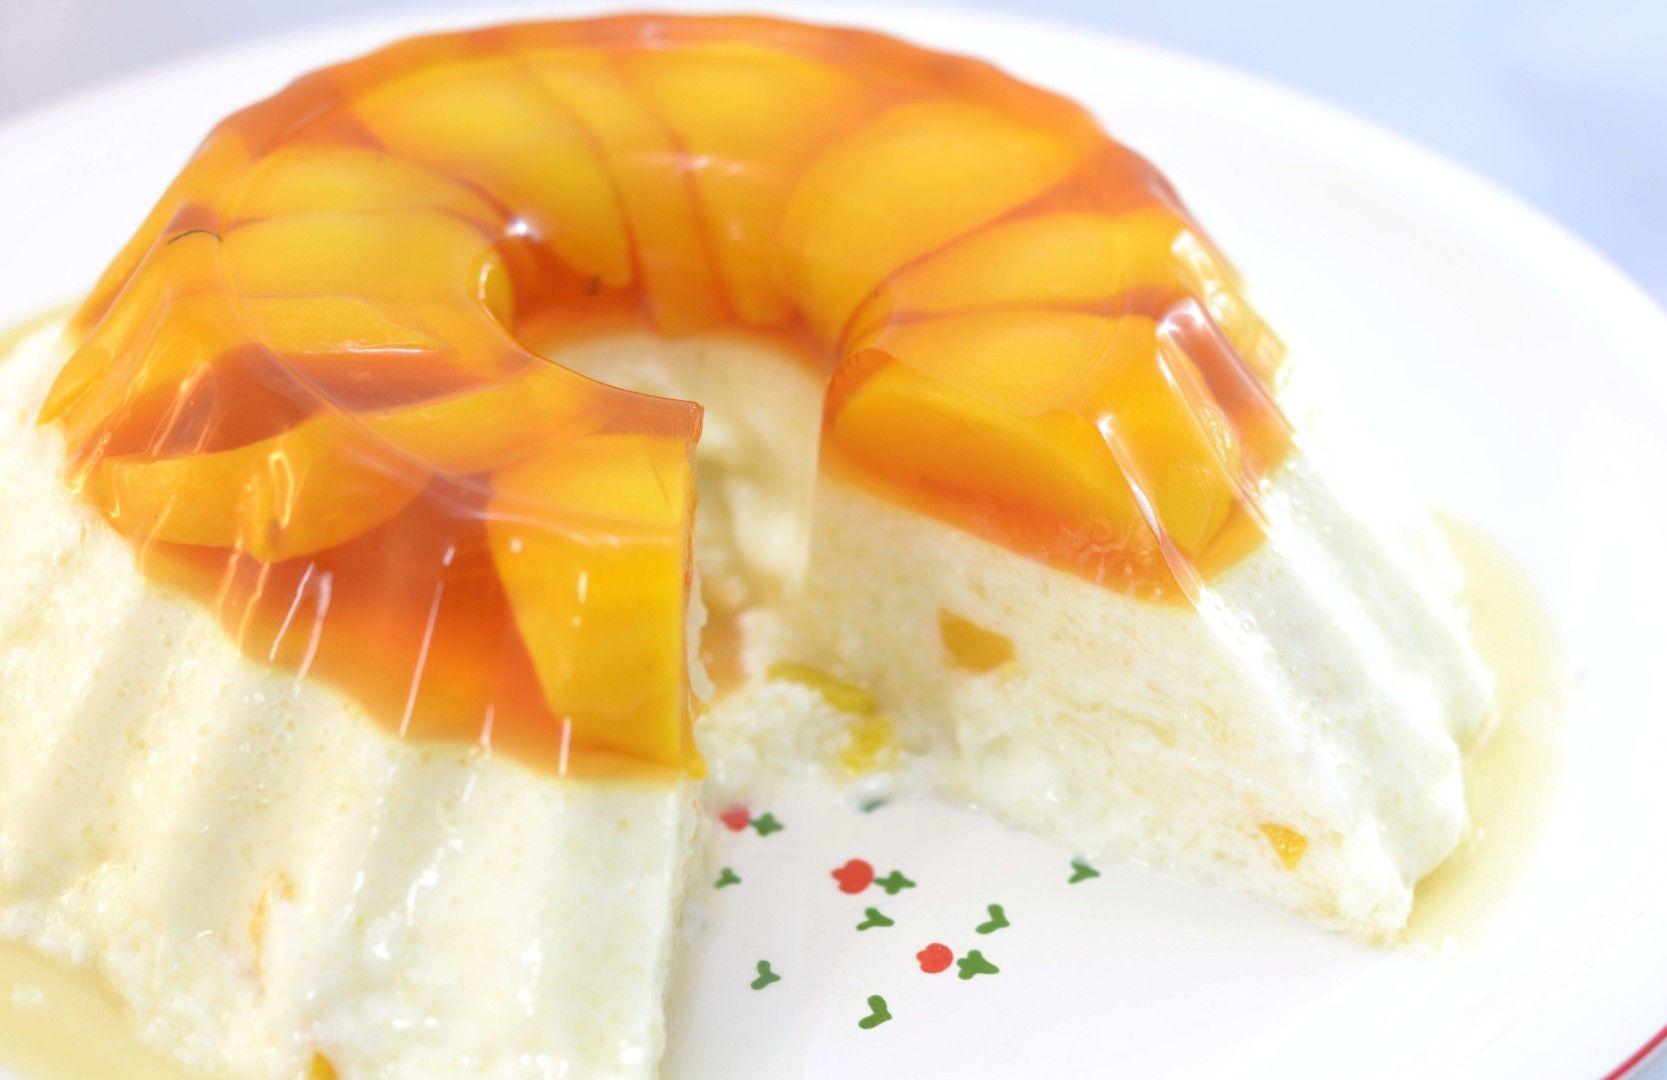 Nueva receta! Gelatina light con yogur de durazno. Clic para verla -> http://www.solopostres.com/re1147.html